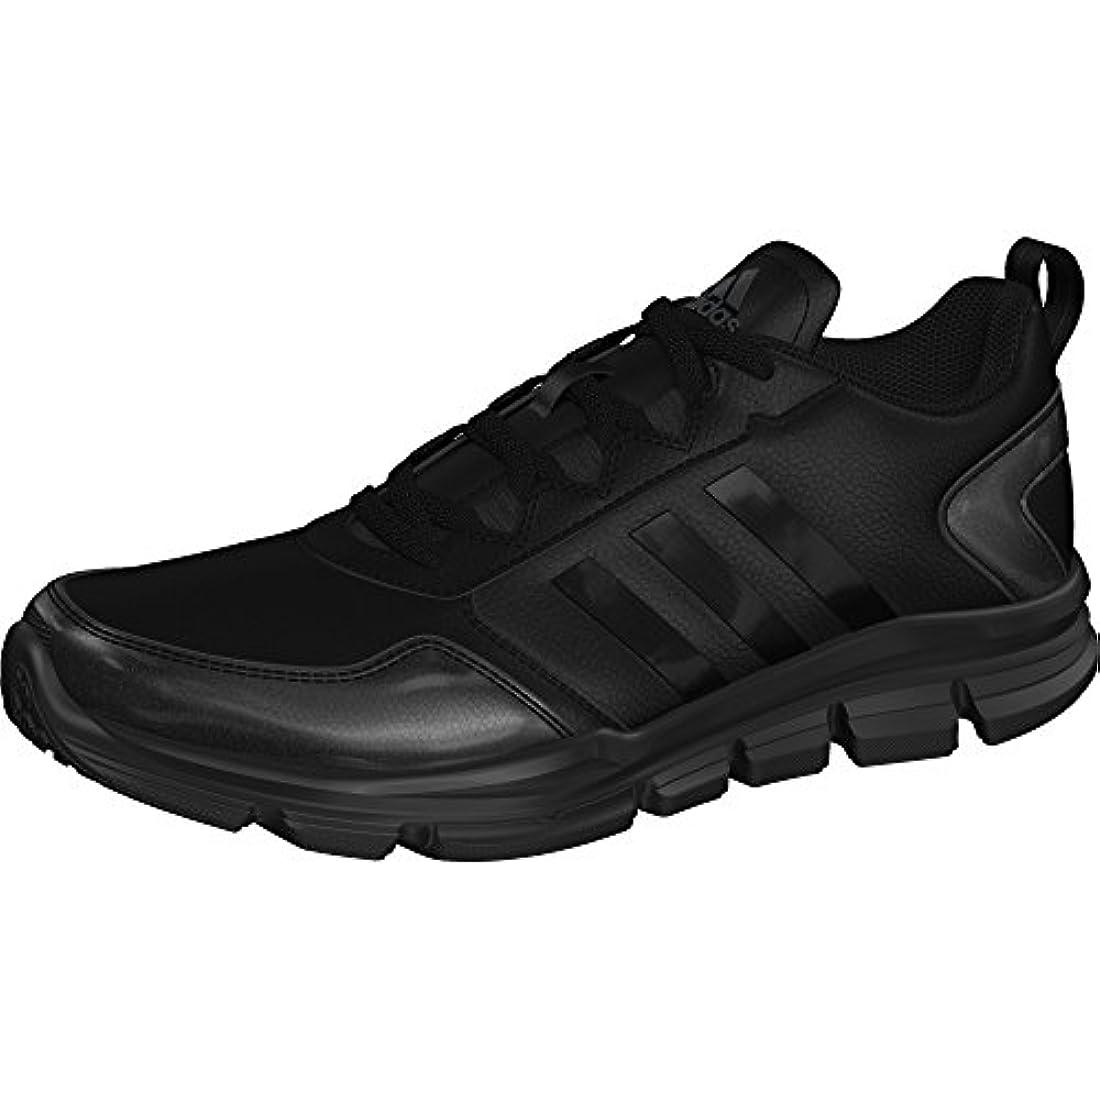 Adidas Men S Speed Trainer  Running Shoes